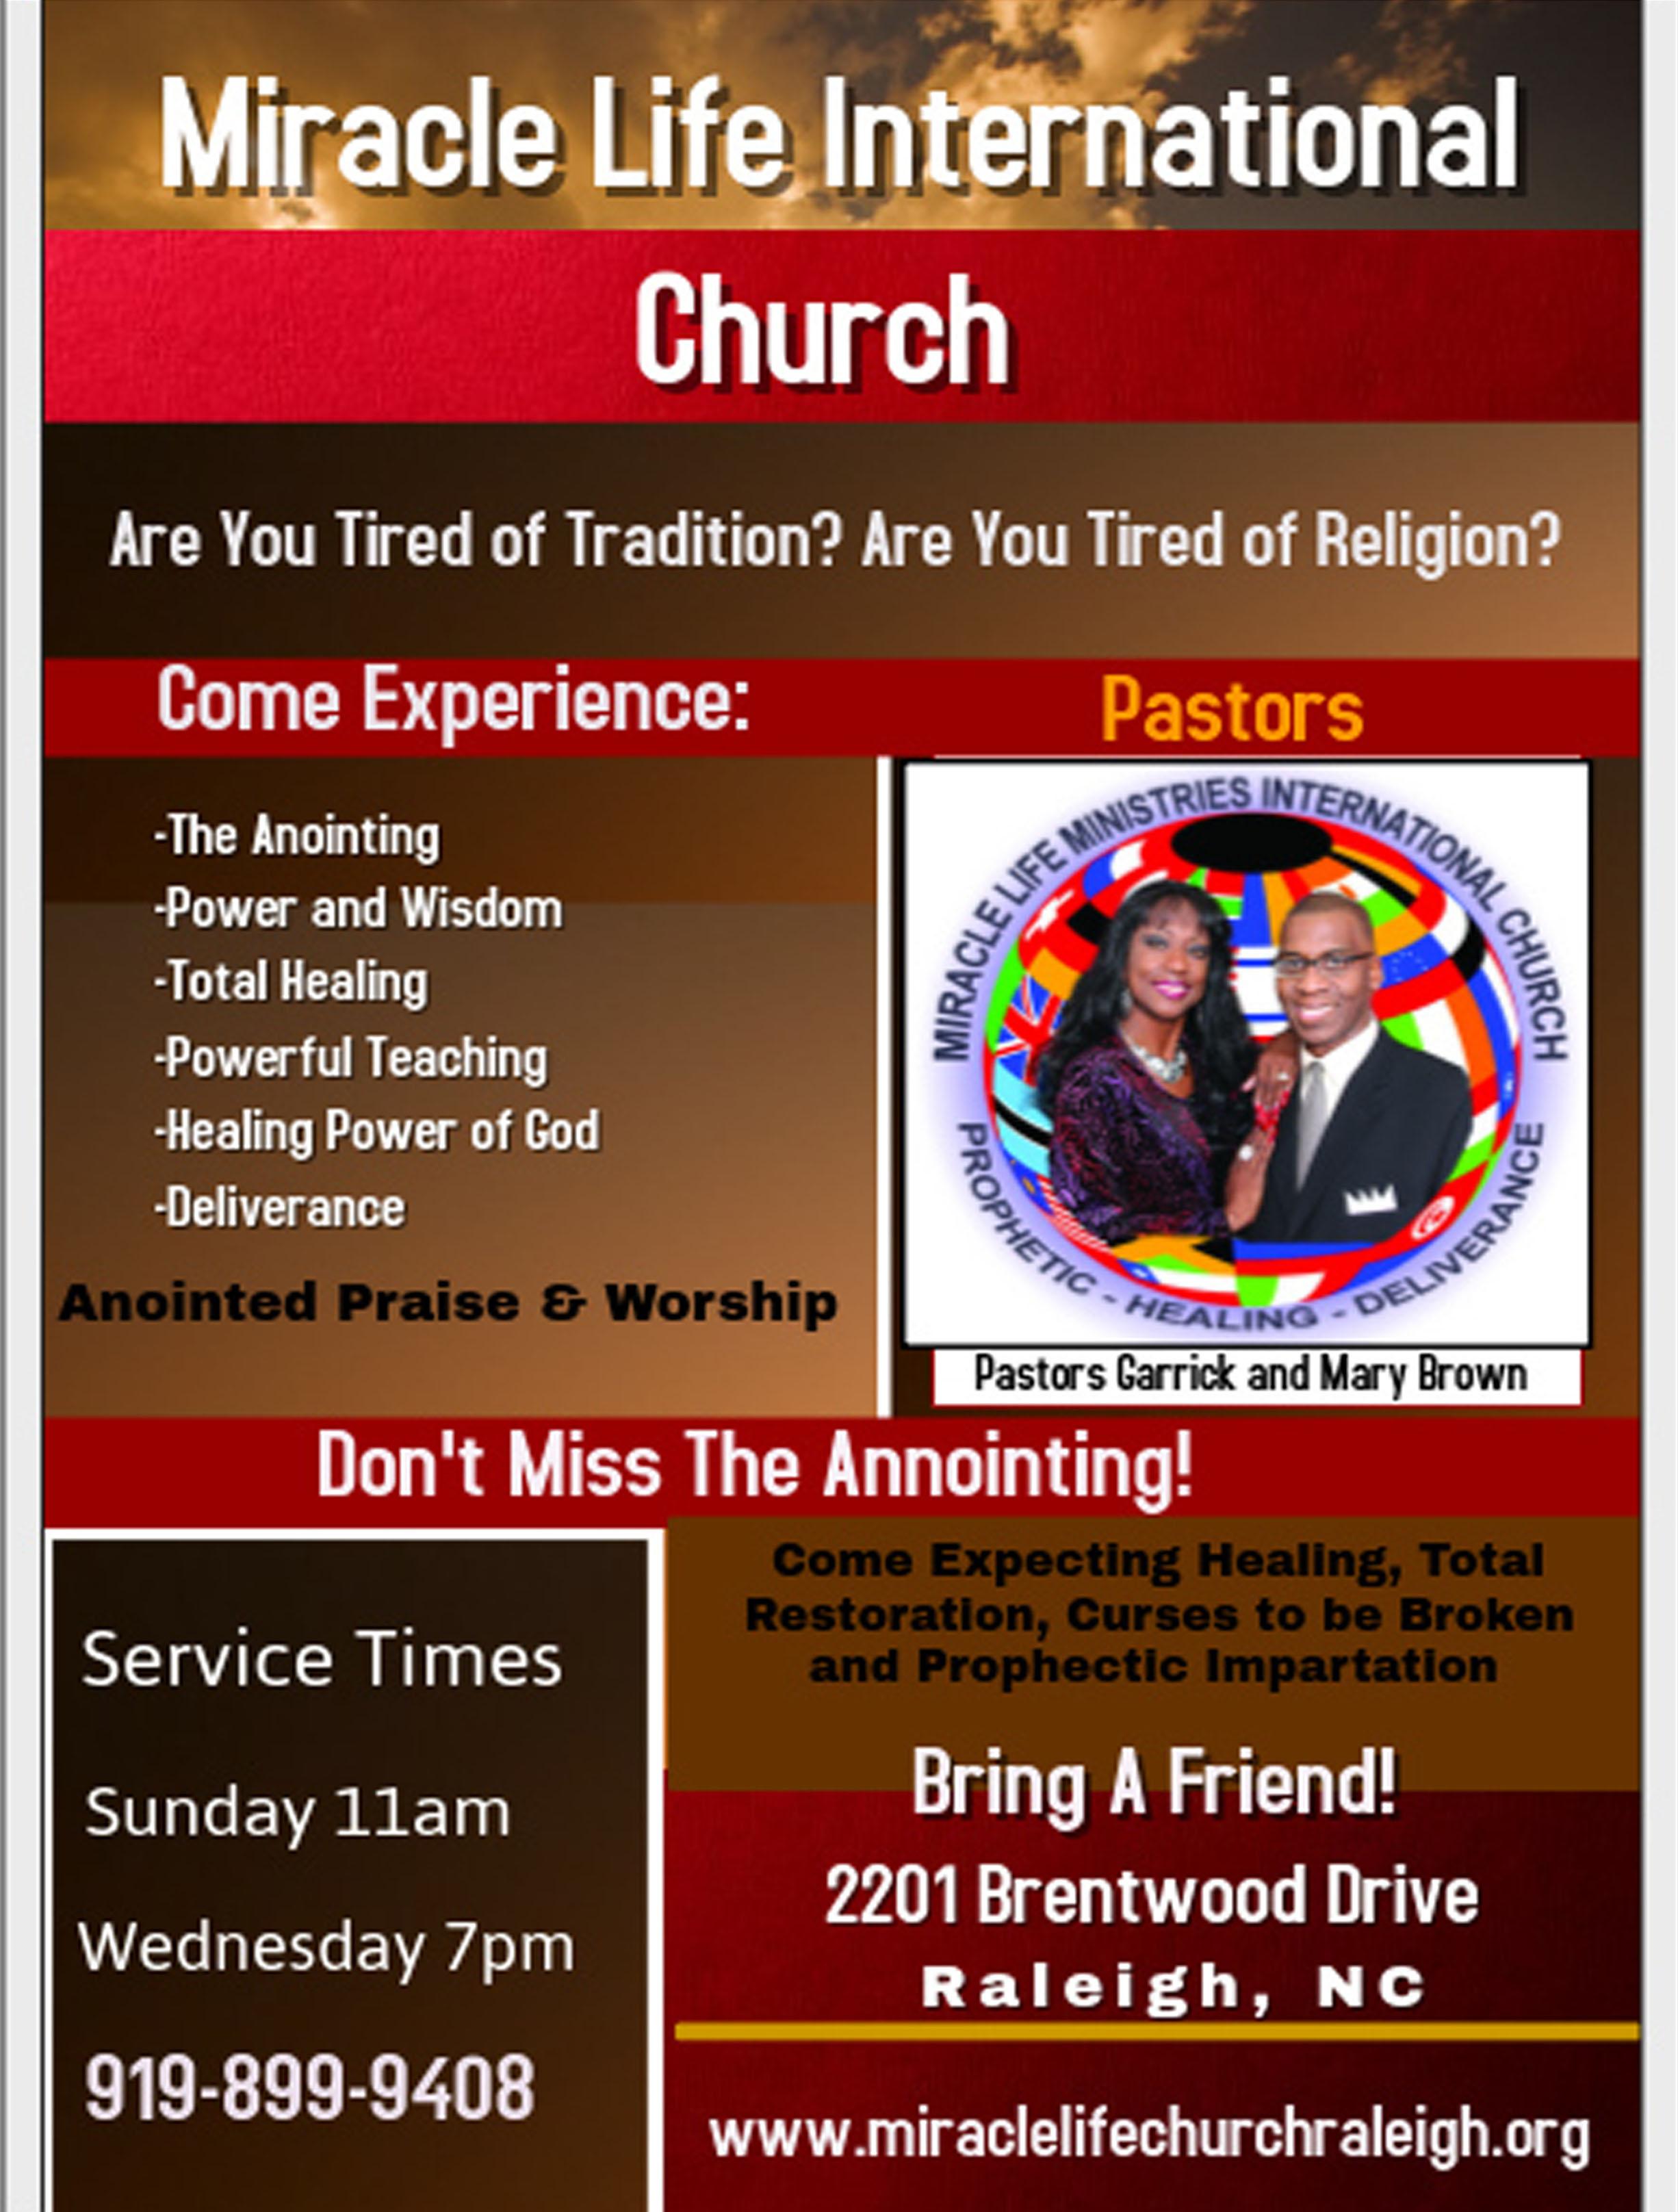 Miracle Life International Church